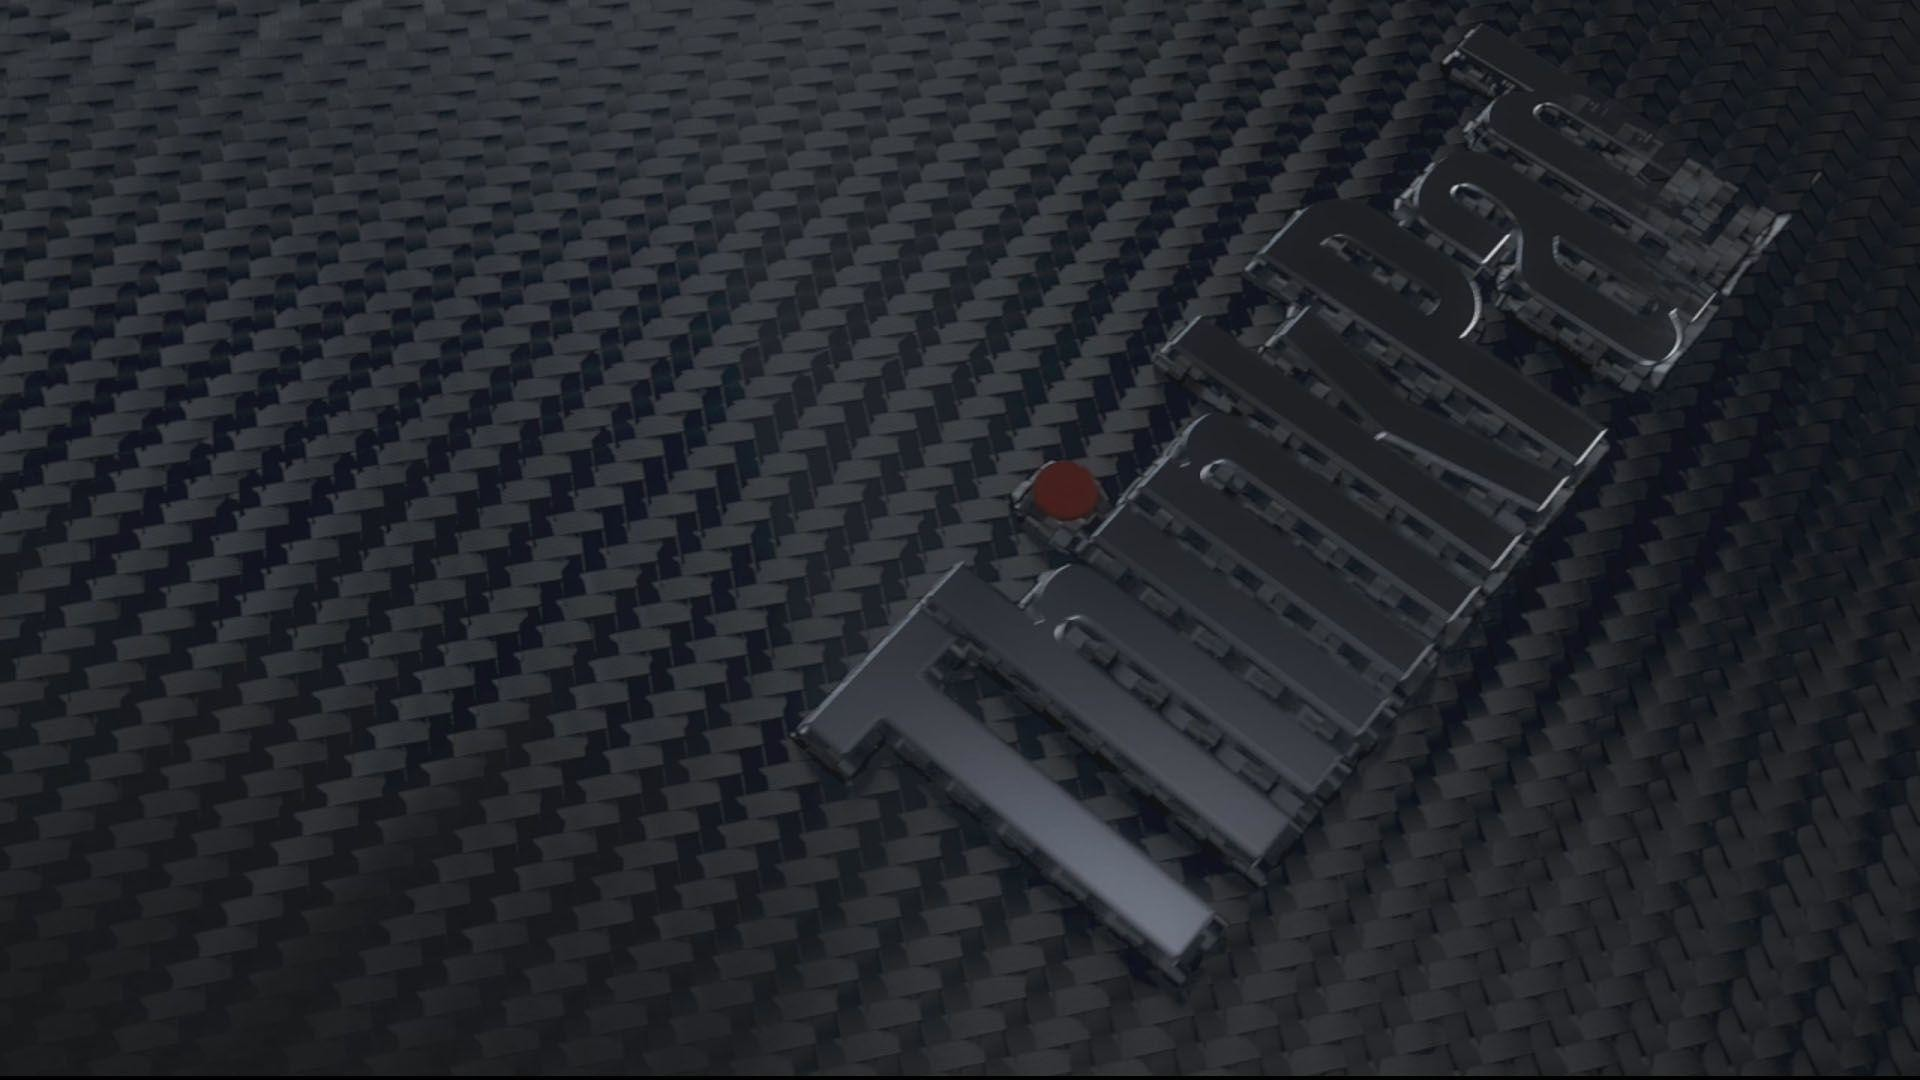 Res: 1920x1080, Lenovo / ThinkPad X1 Carbon | Ivan Vasiljevic